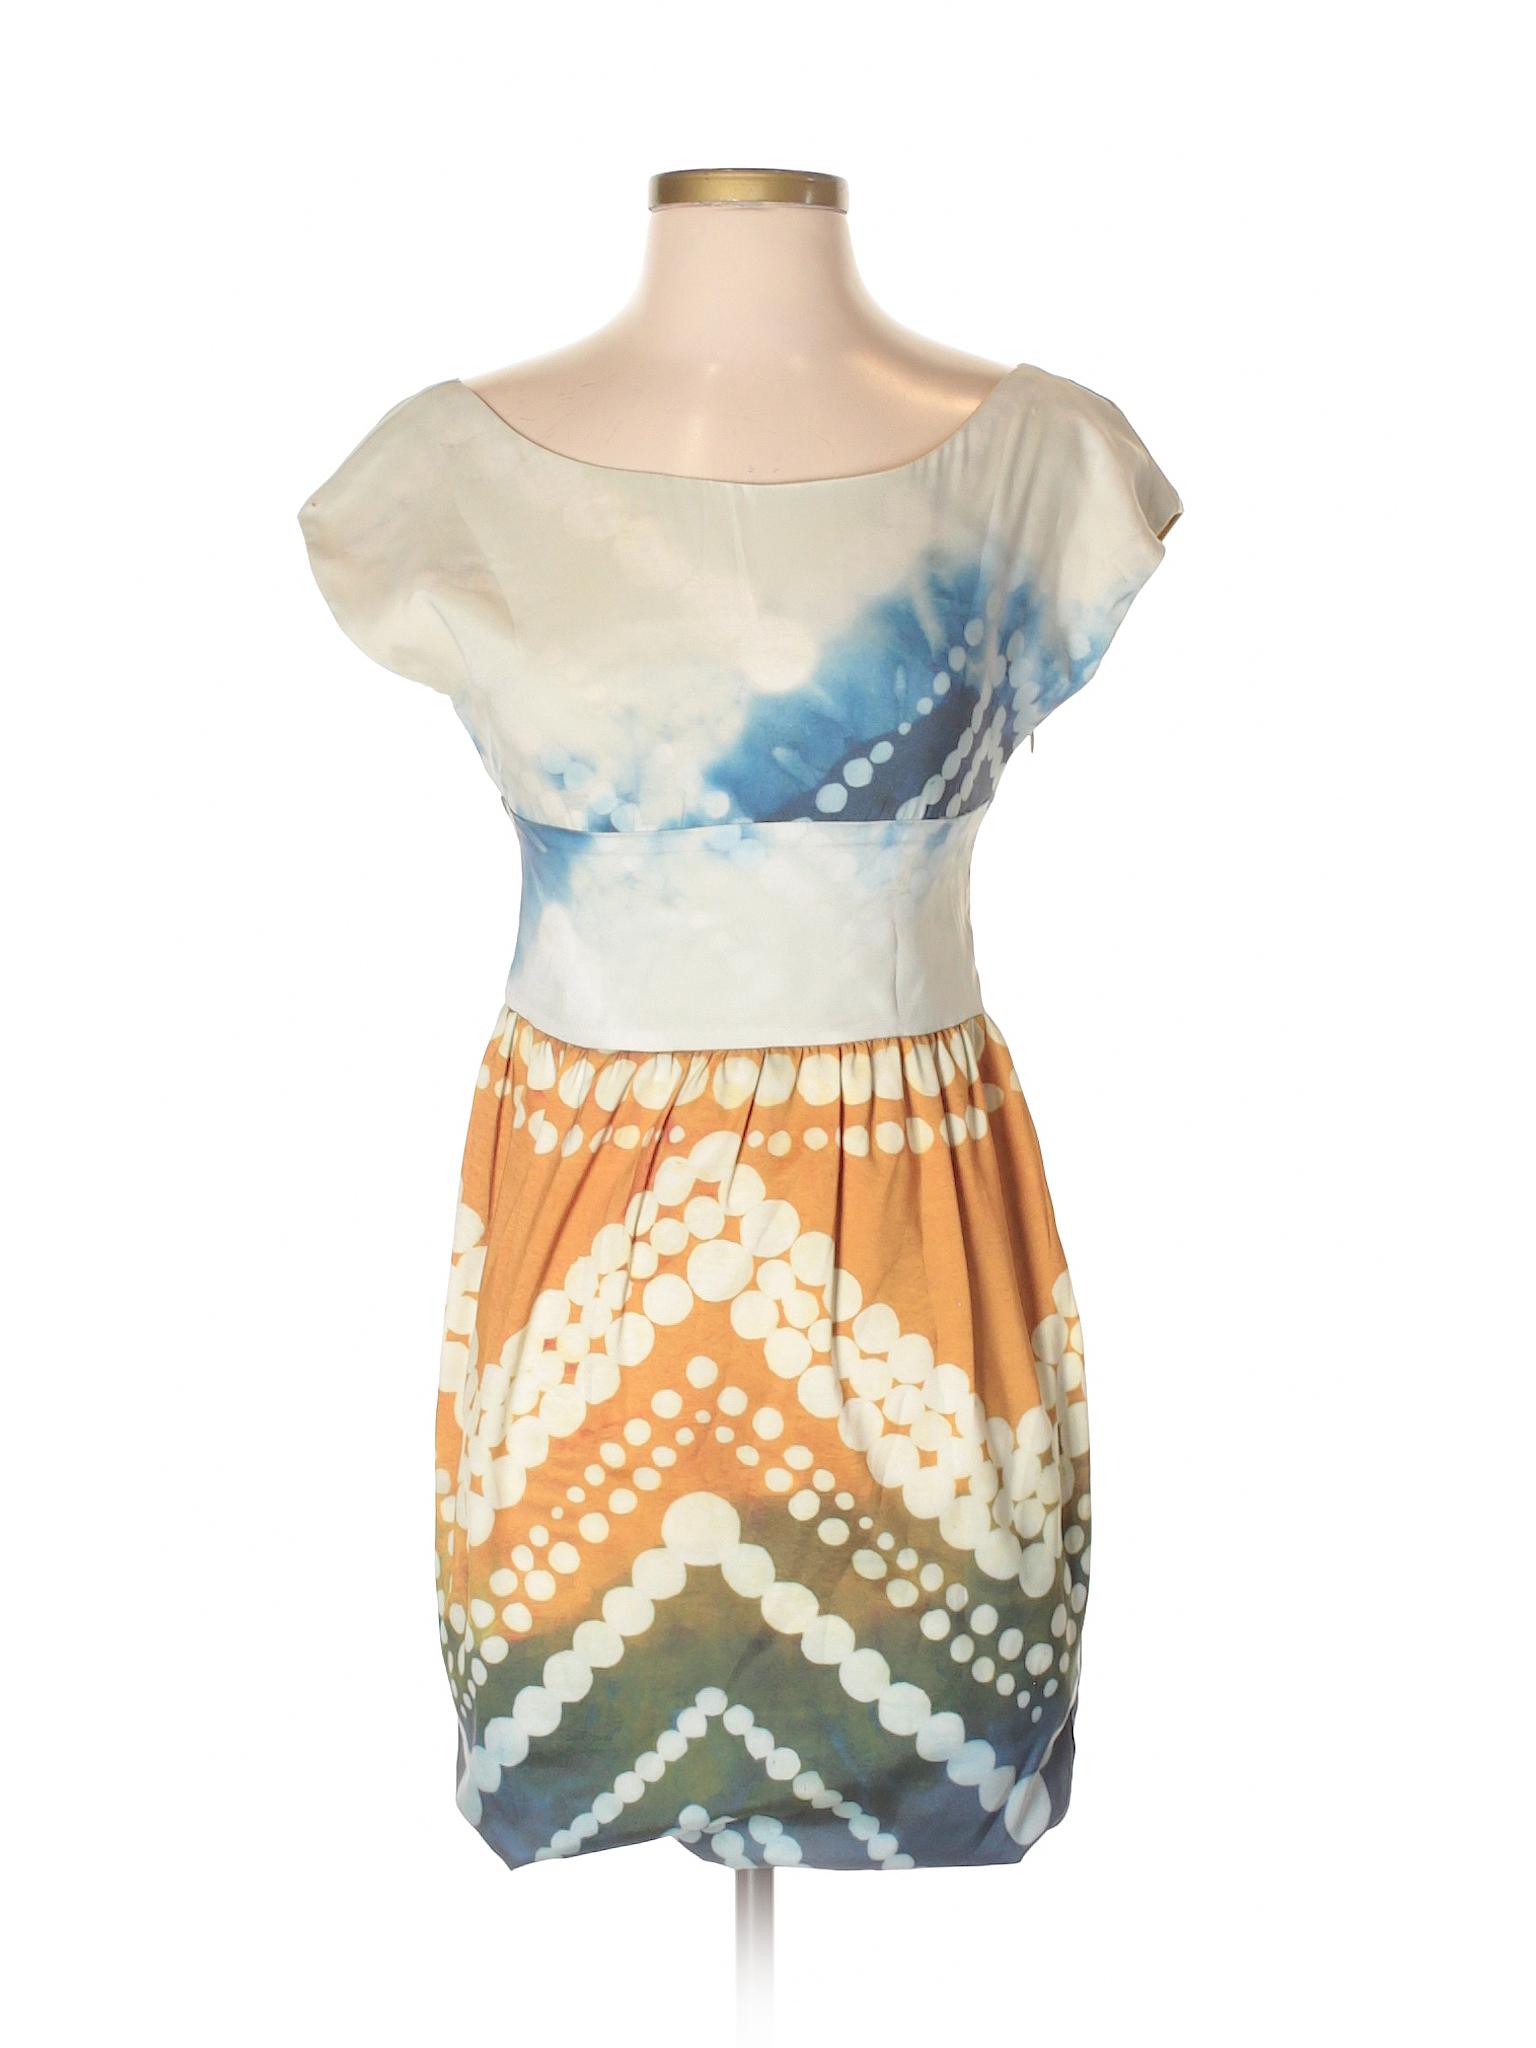 Yana Selling Dress Selling Yana K K K Yana Casual Casual Selling Casual Selling Dress K Dress Yana OTTzwvA